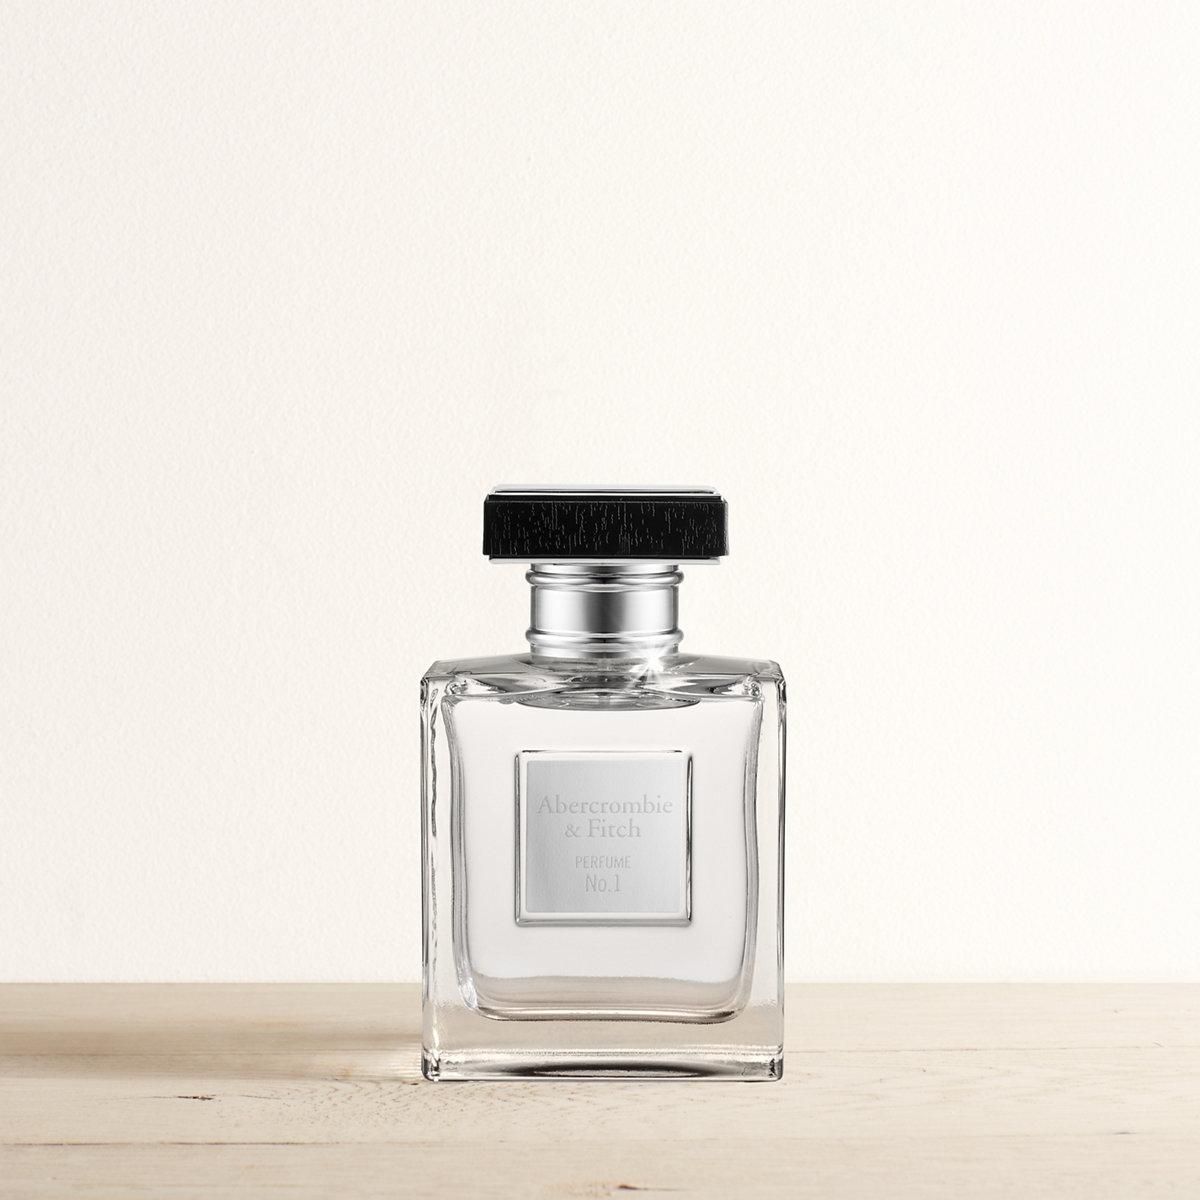 Perfume No. 1